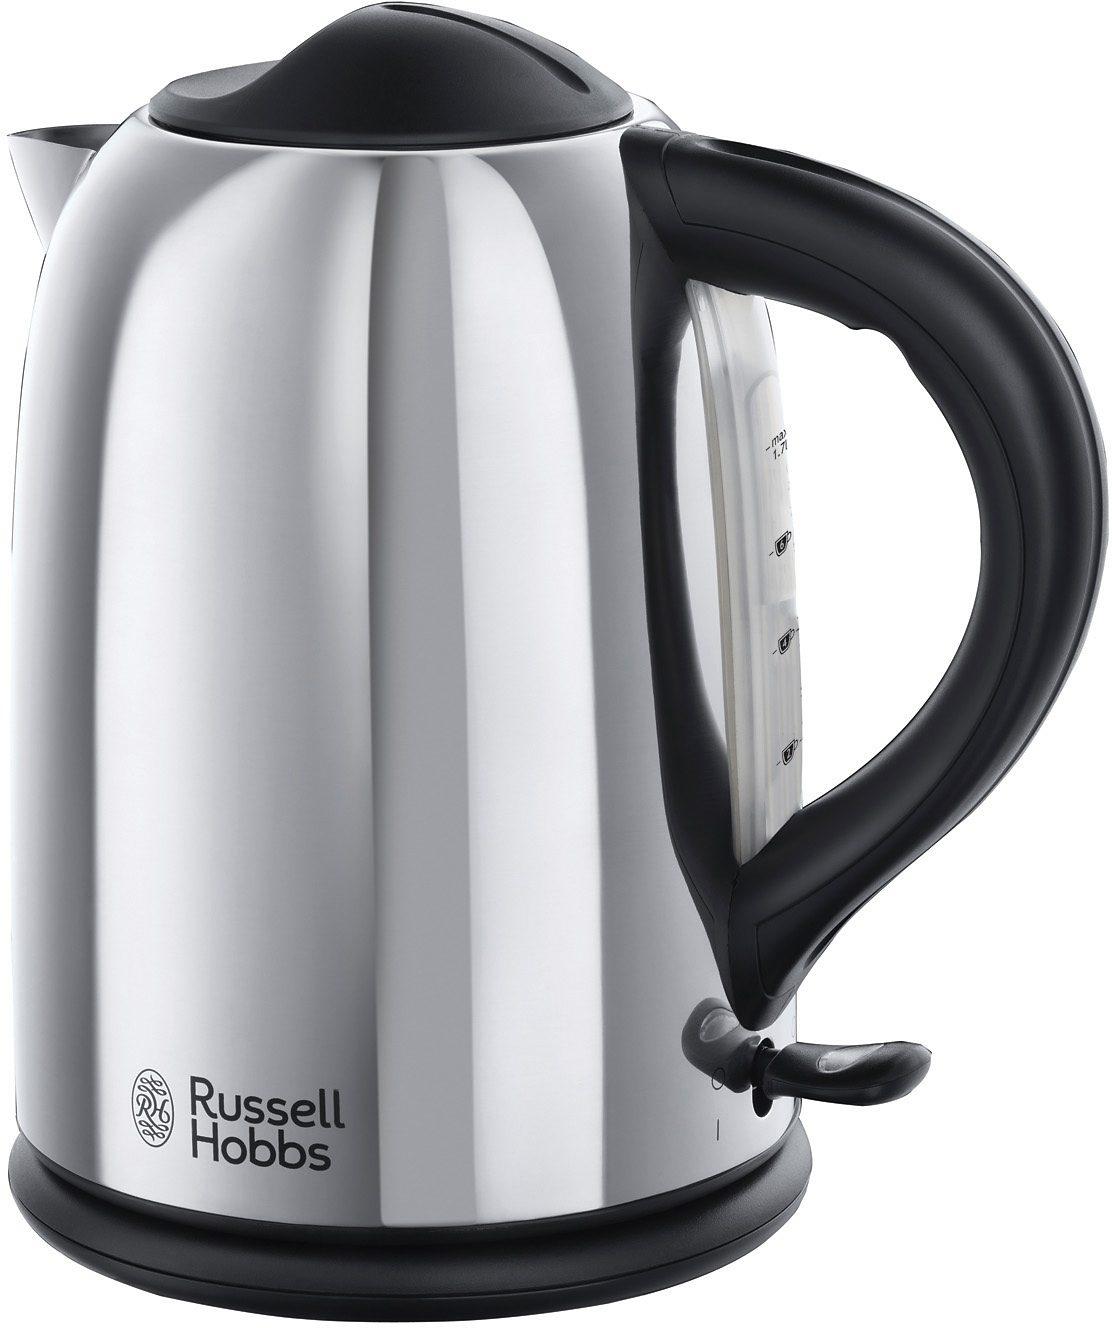 Russell Hobbs Wasserkocher Chester 20420-70, für 1,7 Liter, 2400 Watt